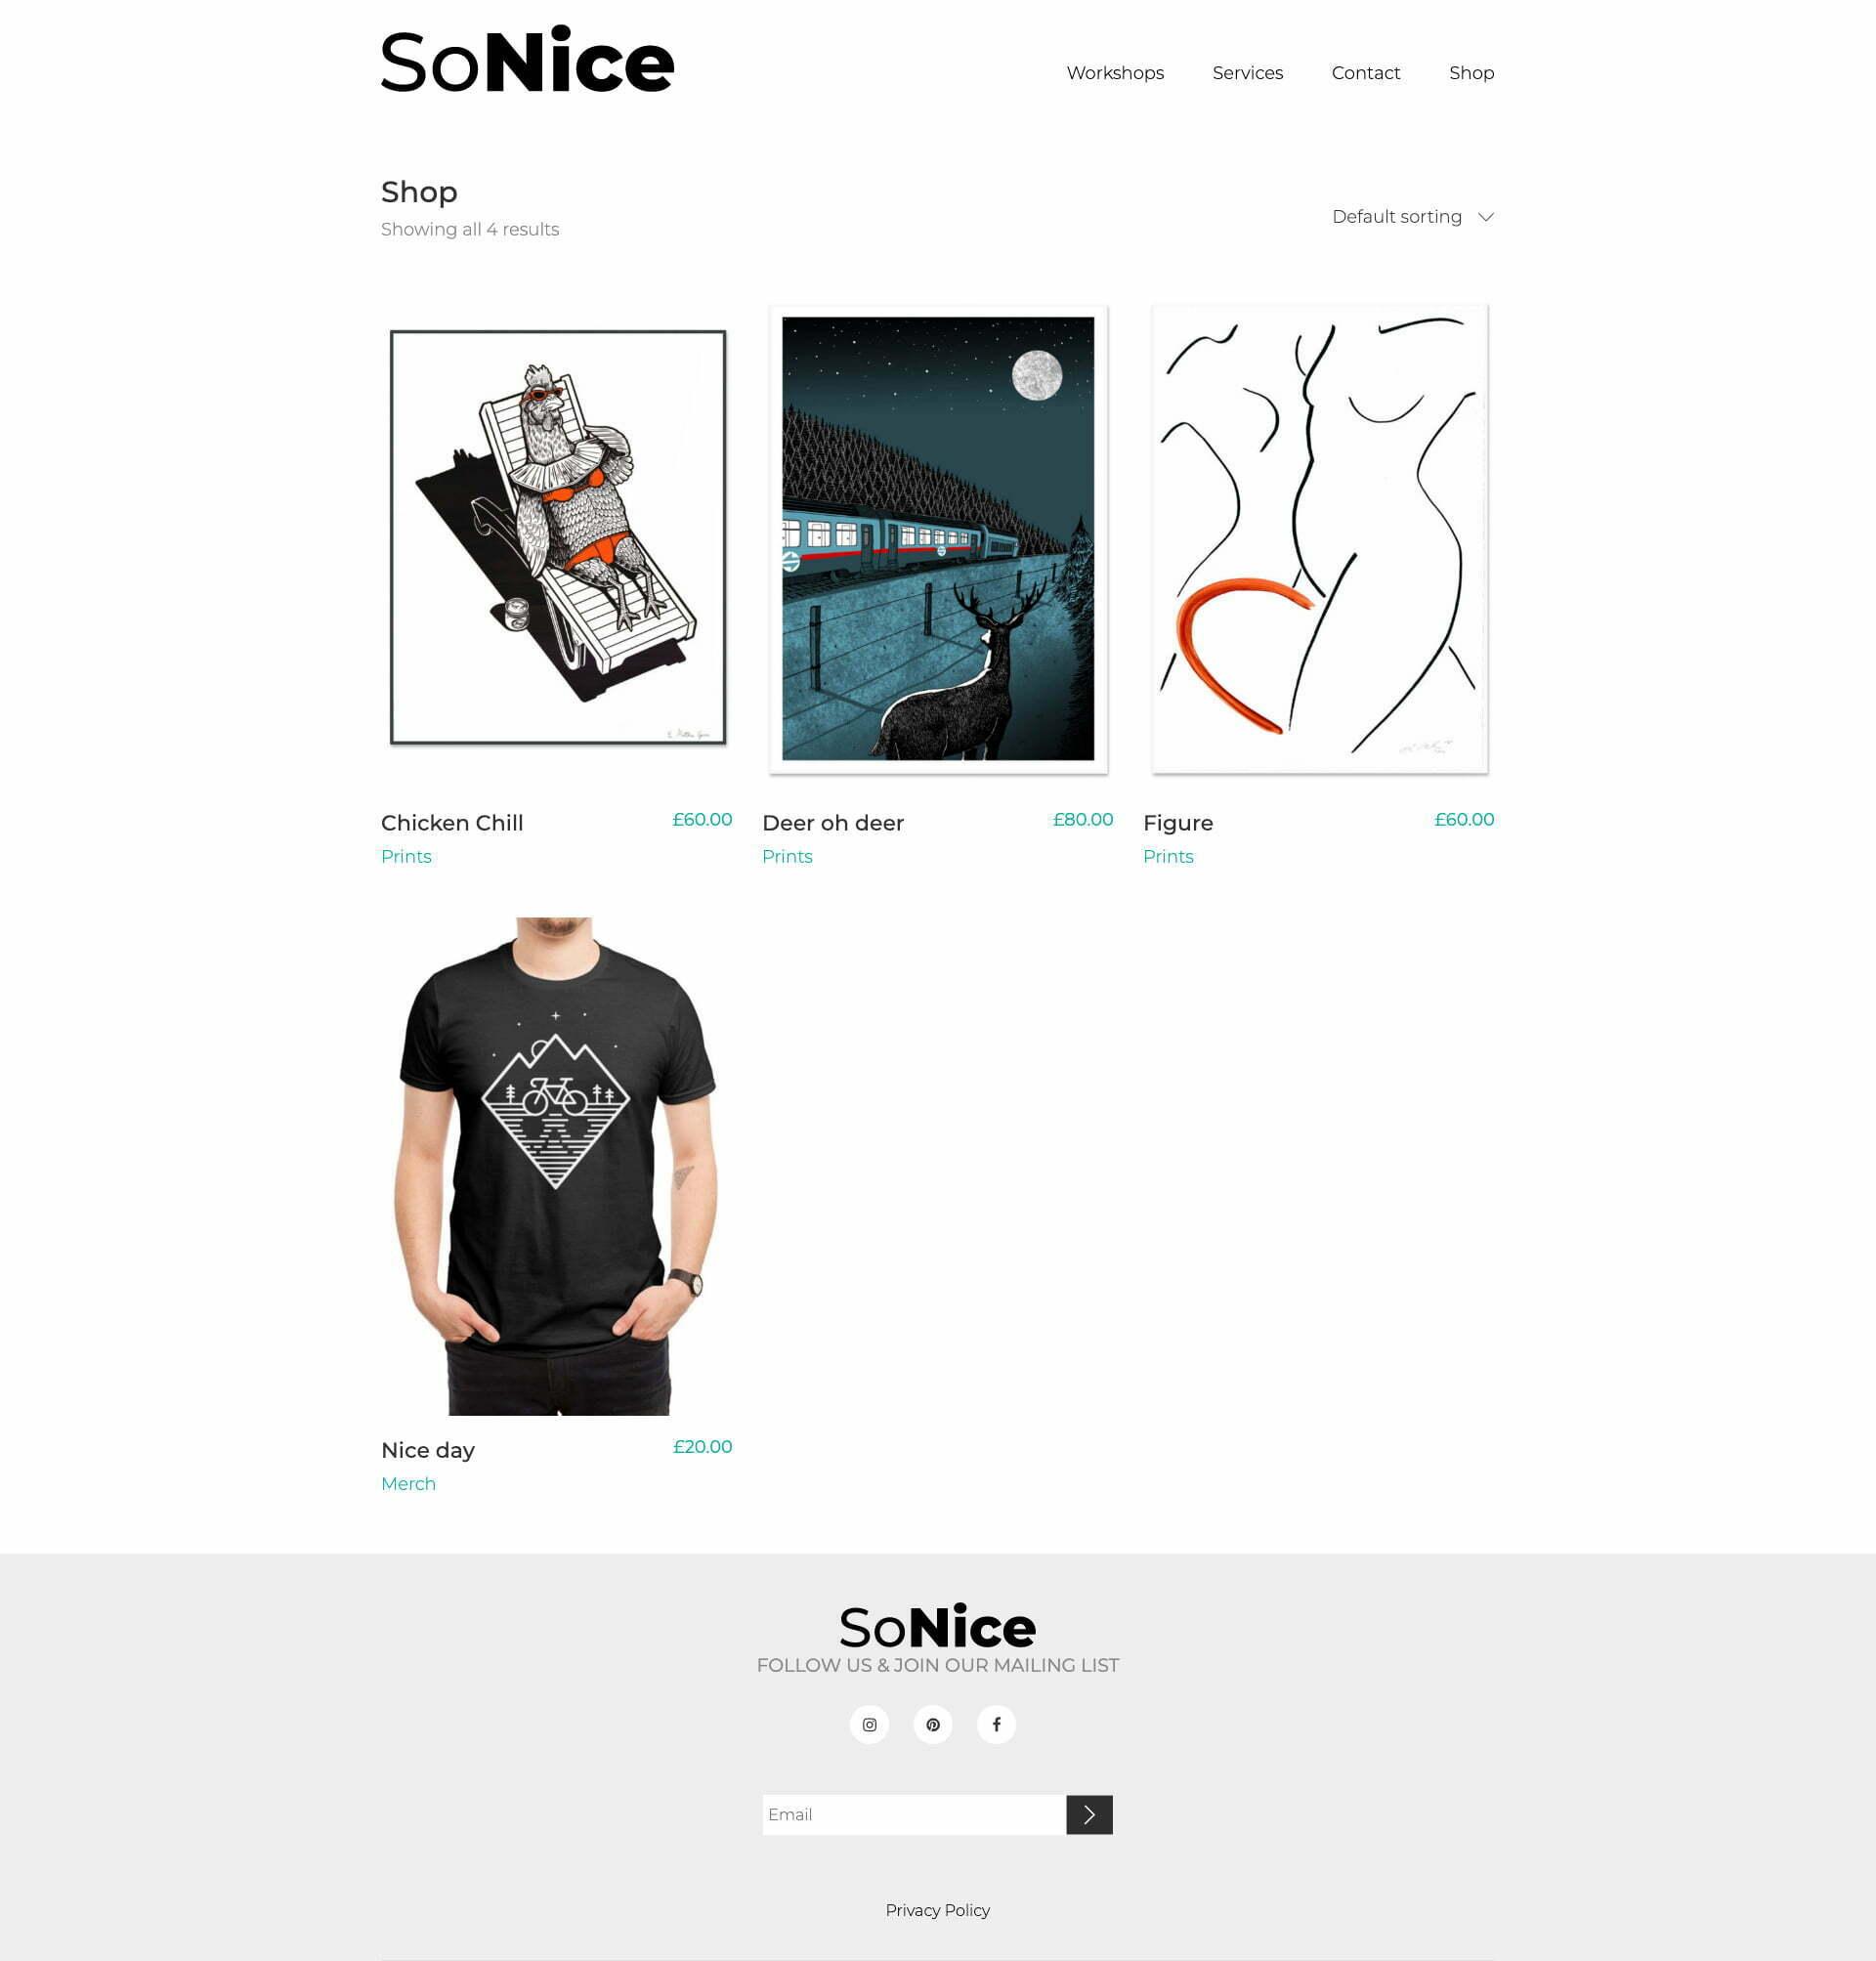 sonicestudios-shop